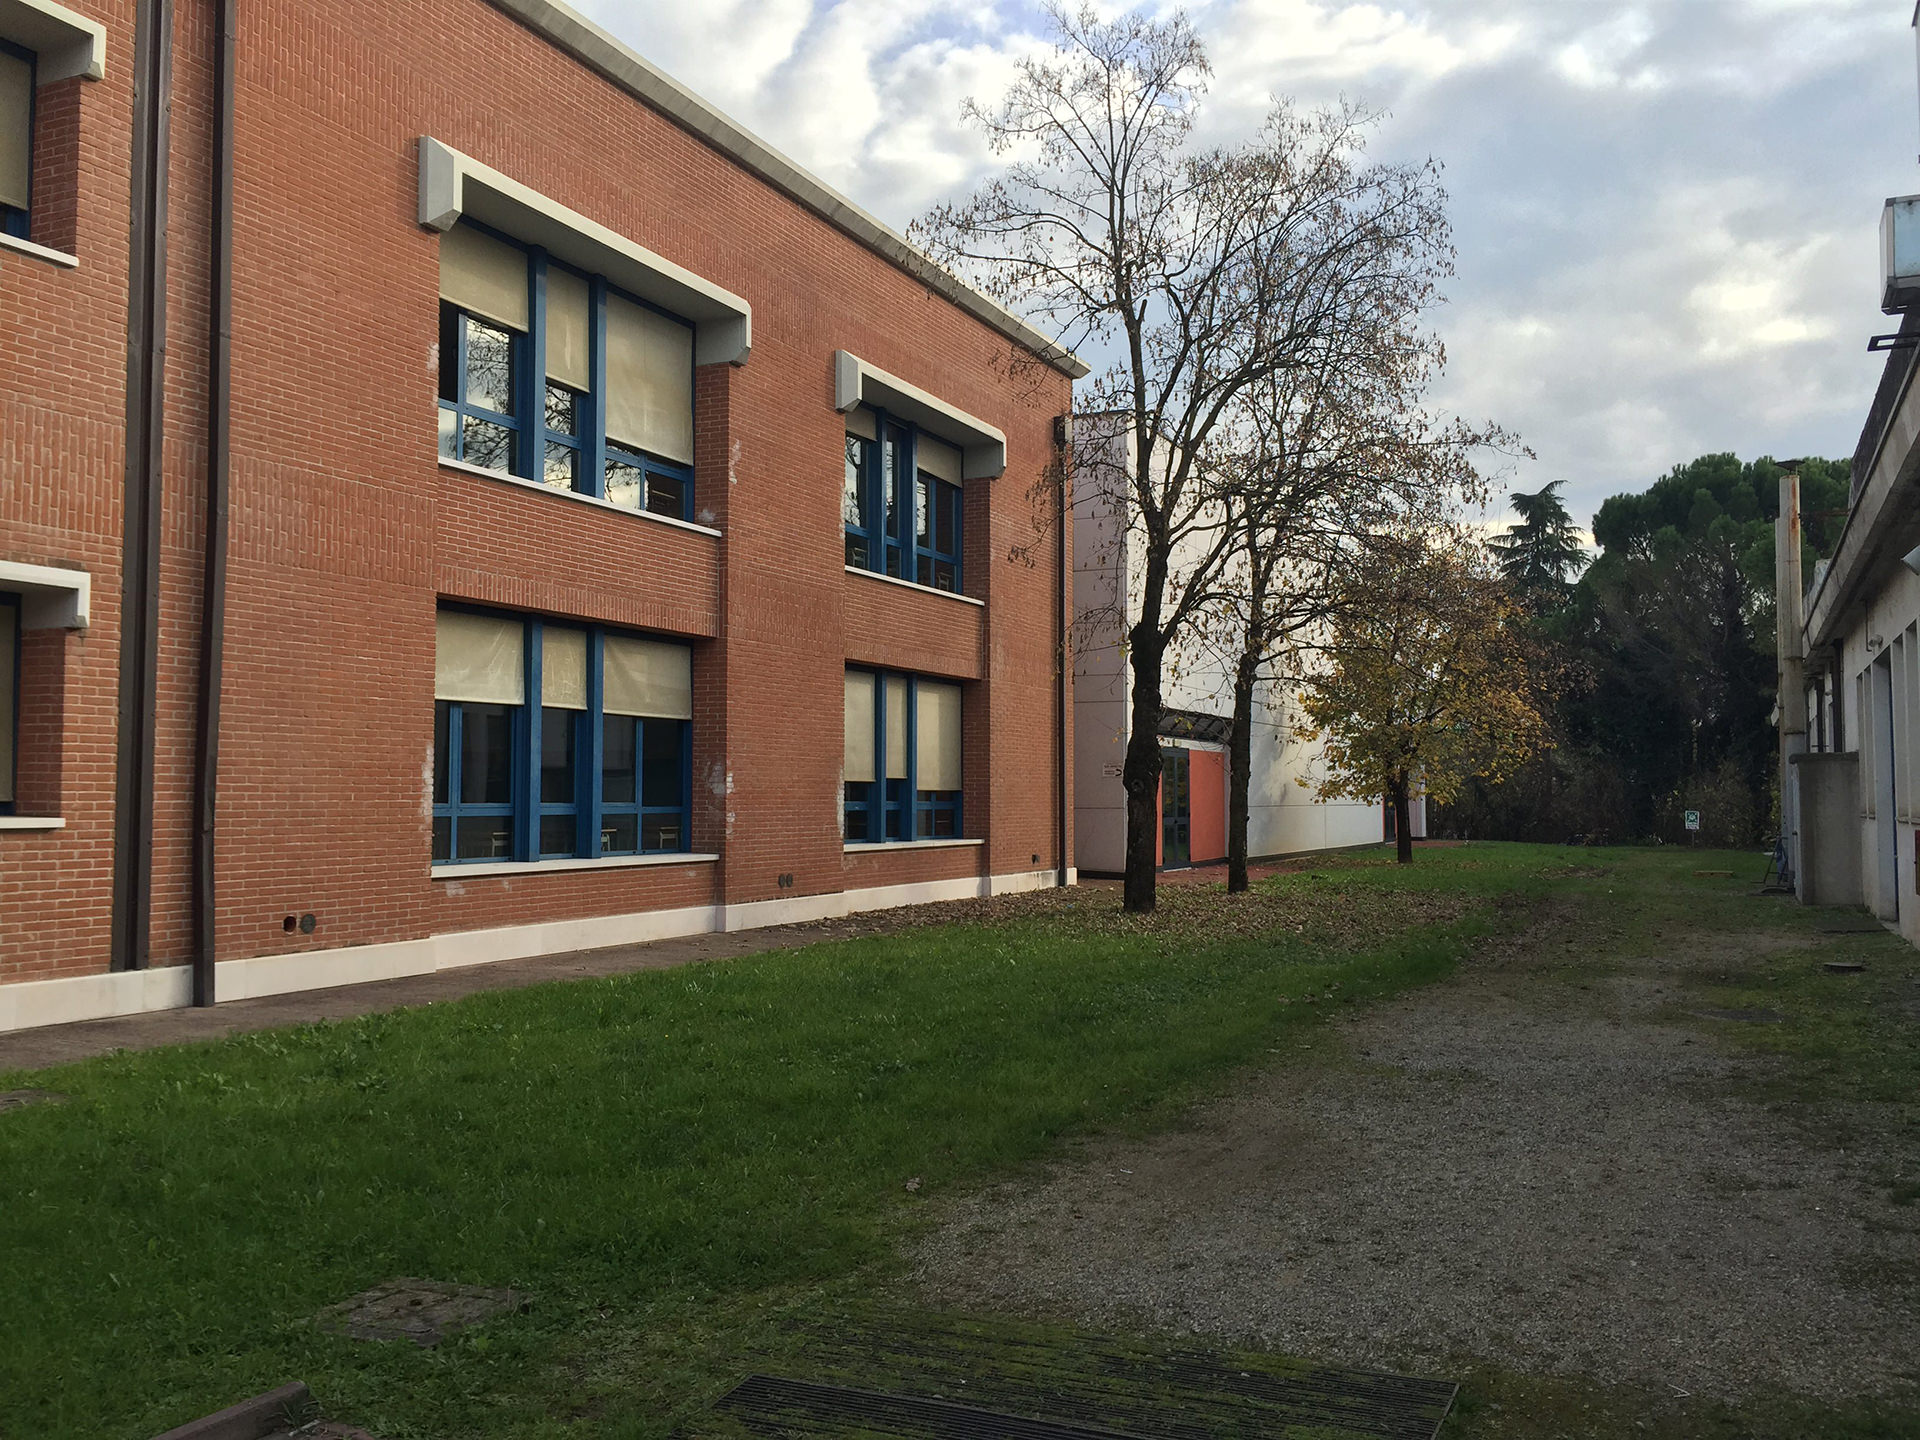 Scuola esterno vista destra